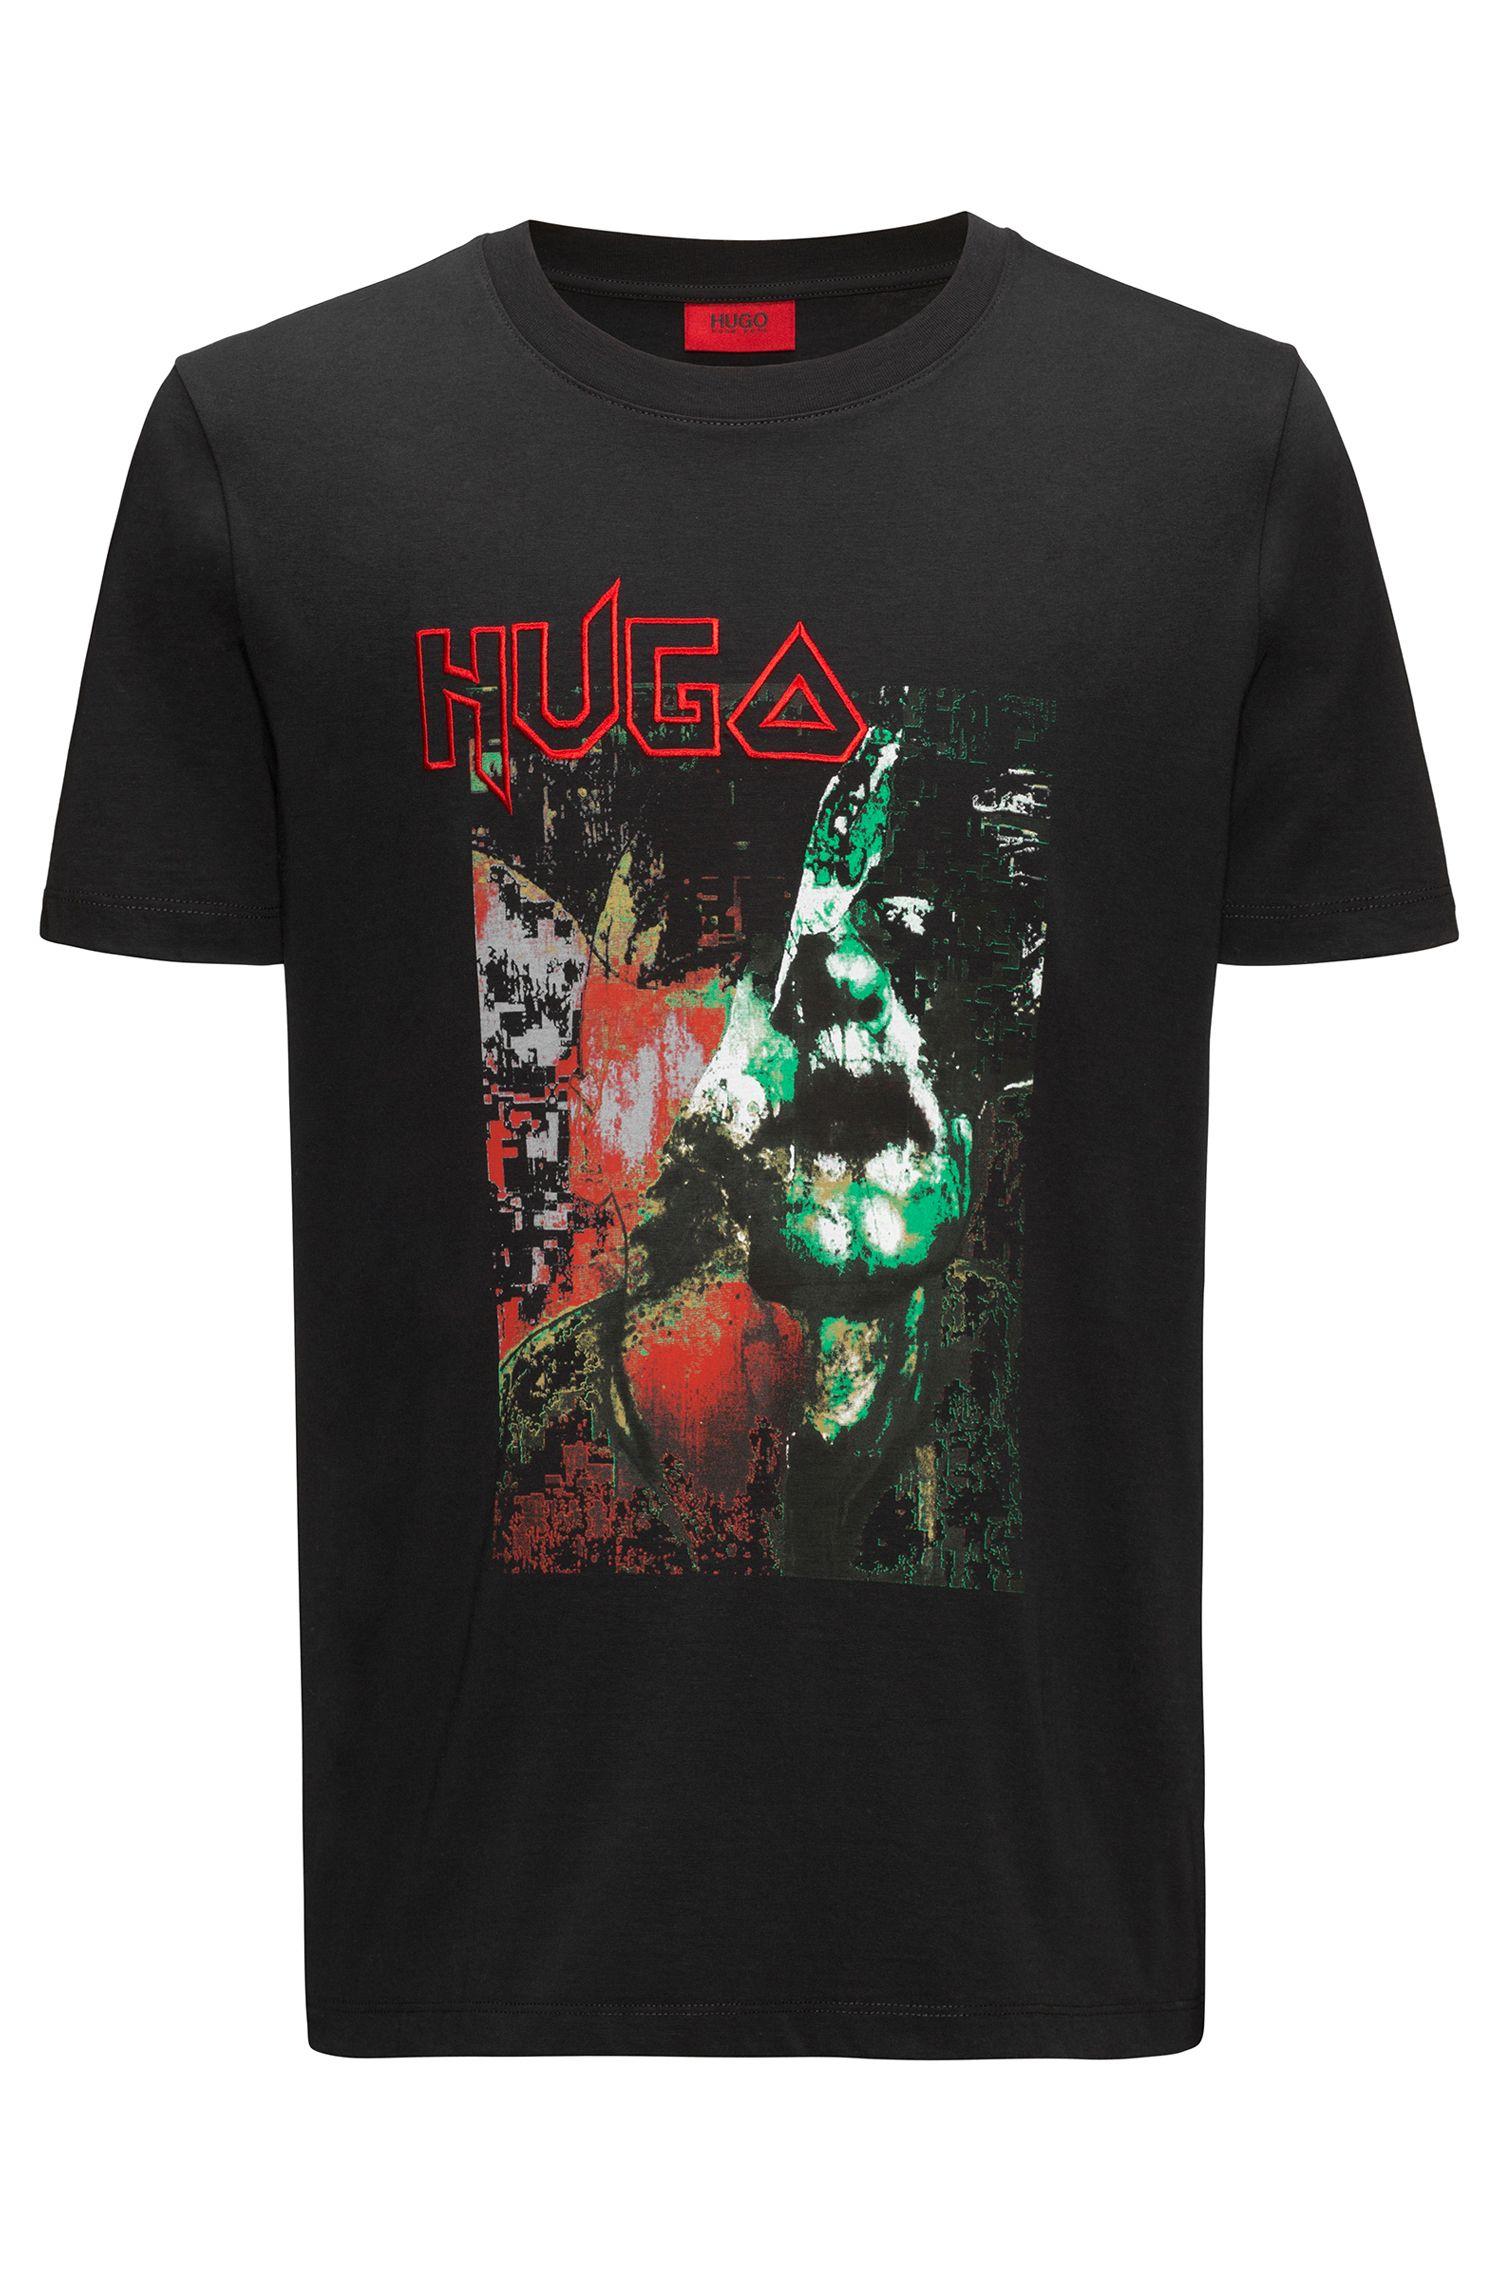 T-Shirt aus Baumwolle mit markantem Print